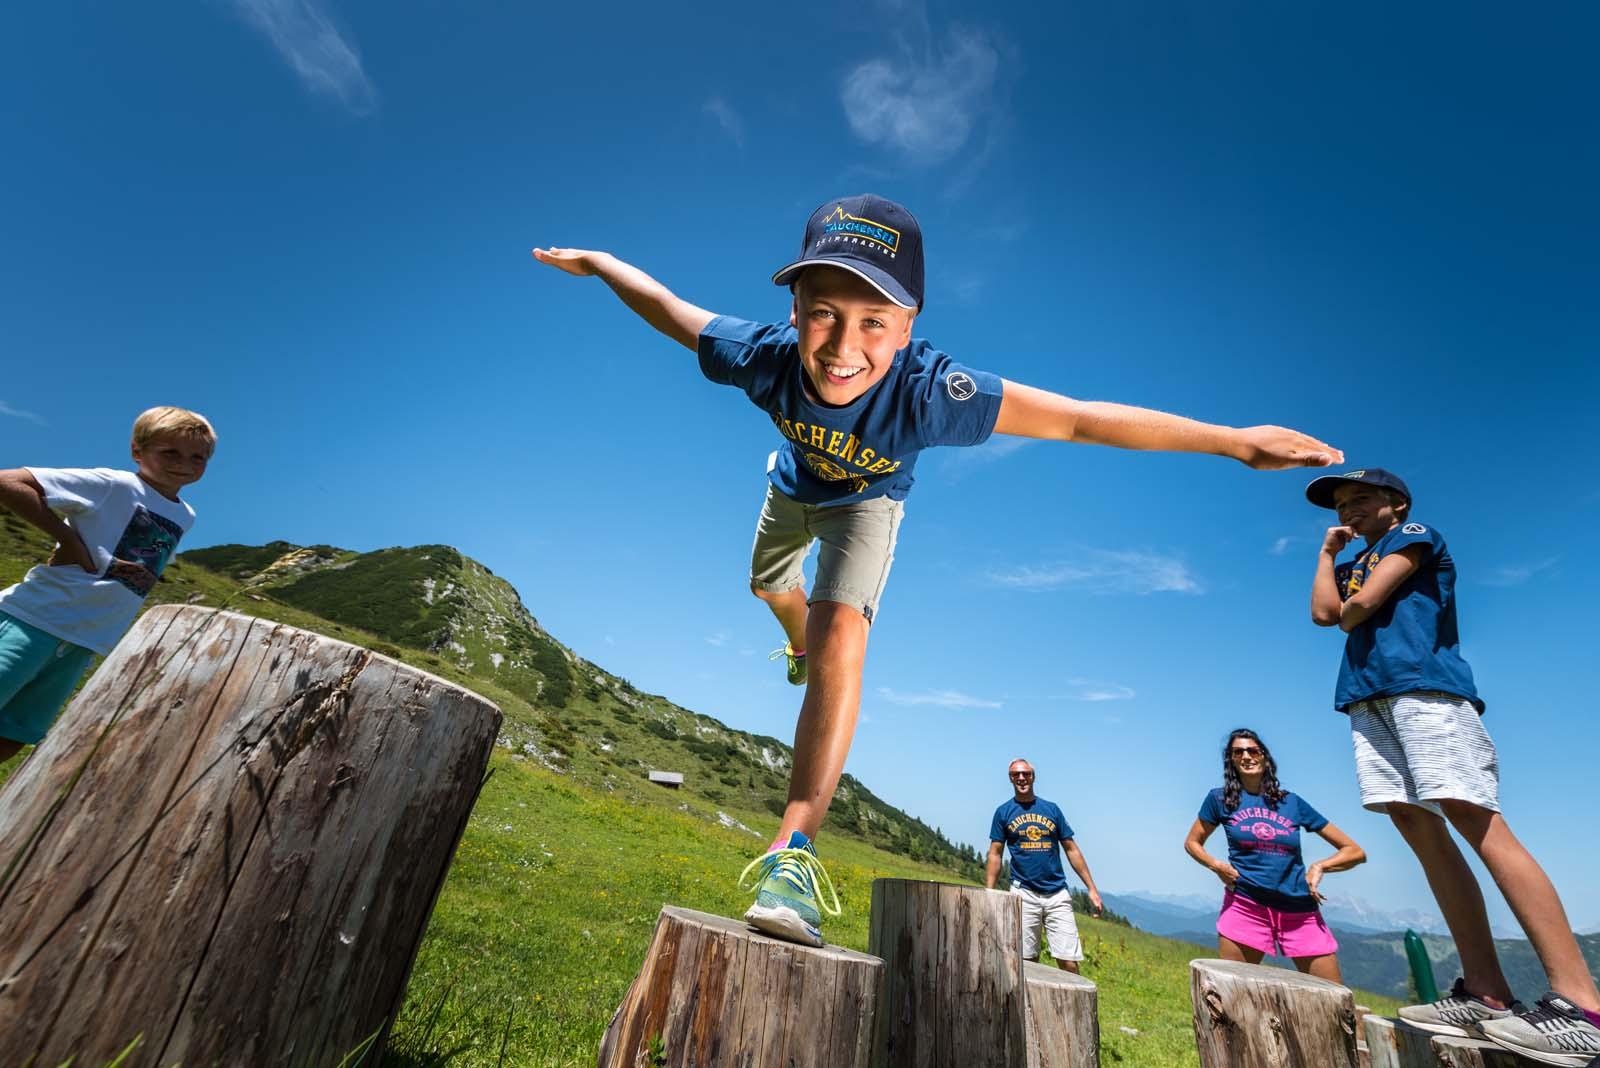 Gamskogelbahn lift into the alpine summer